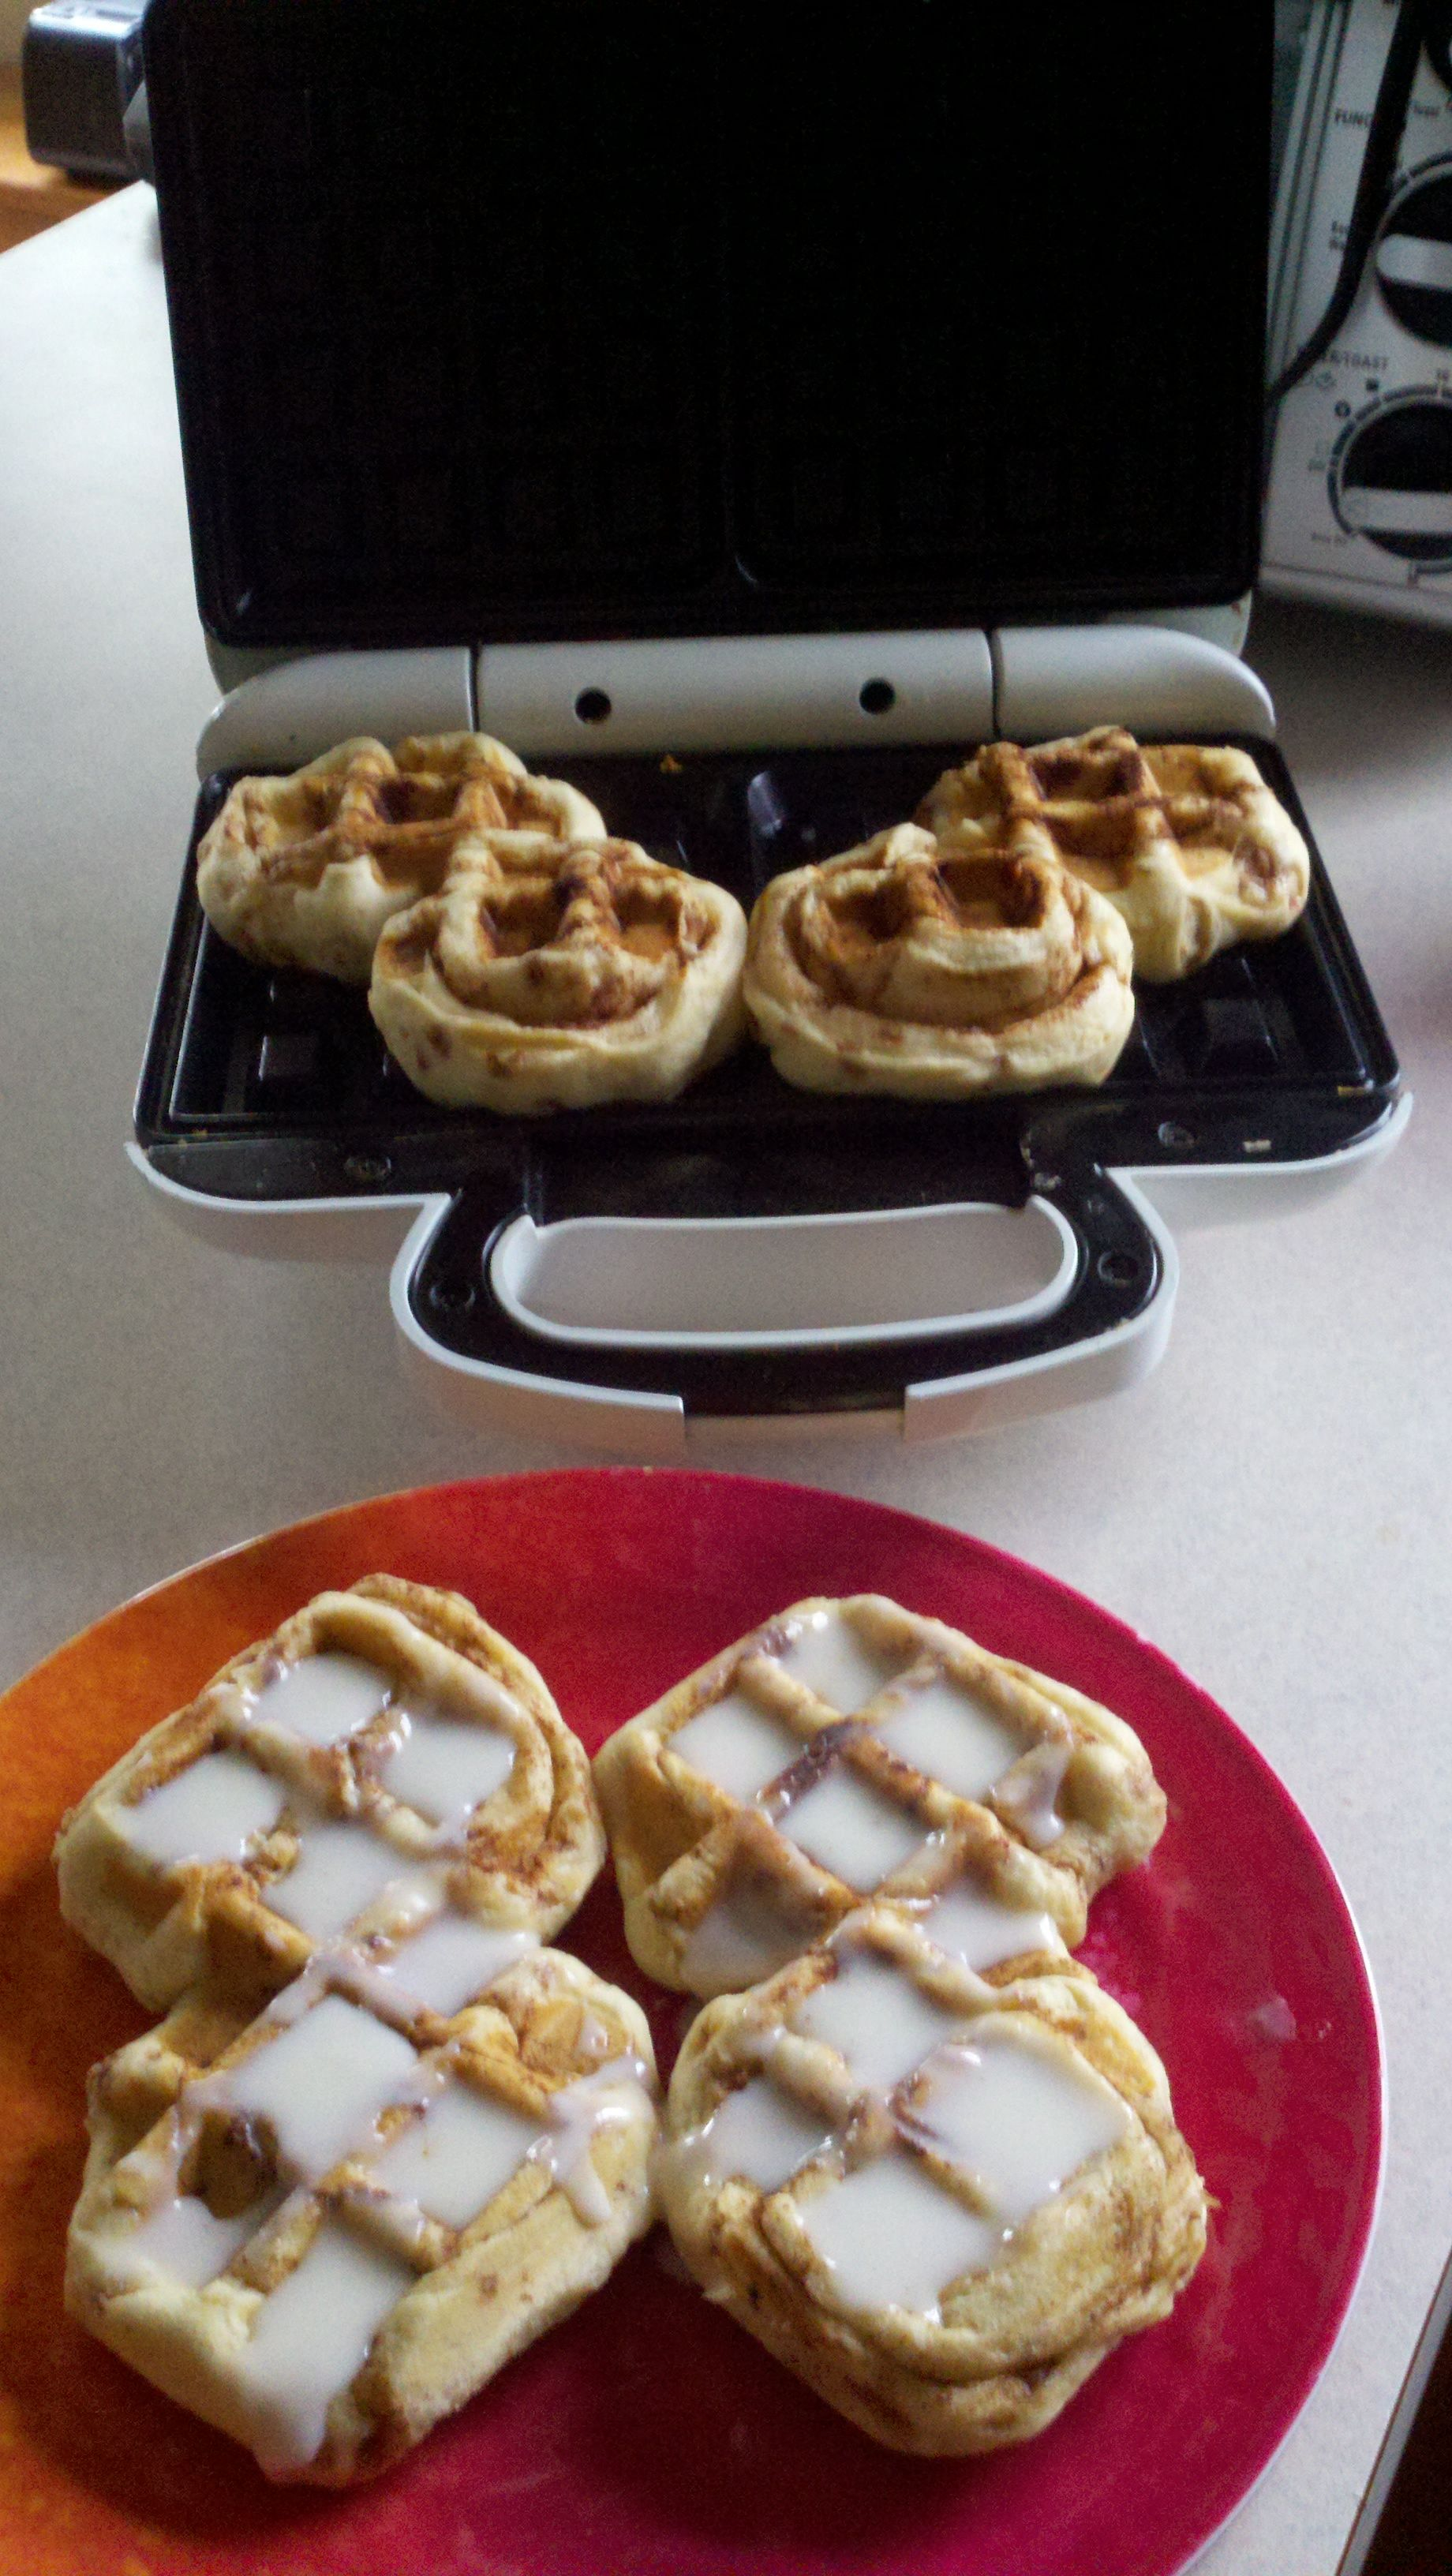 Canned cinnamon rolls, in a waffle maker.